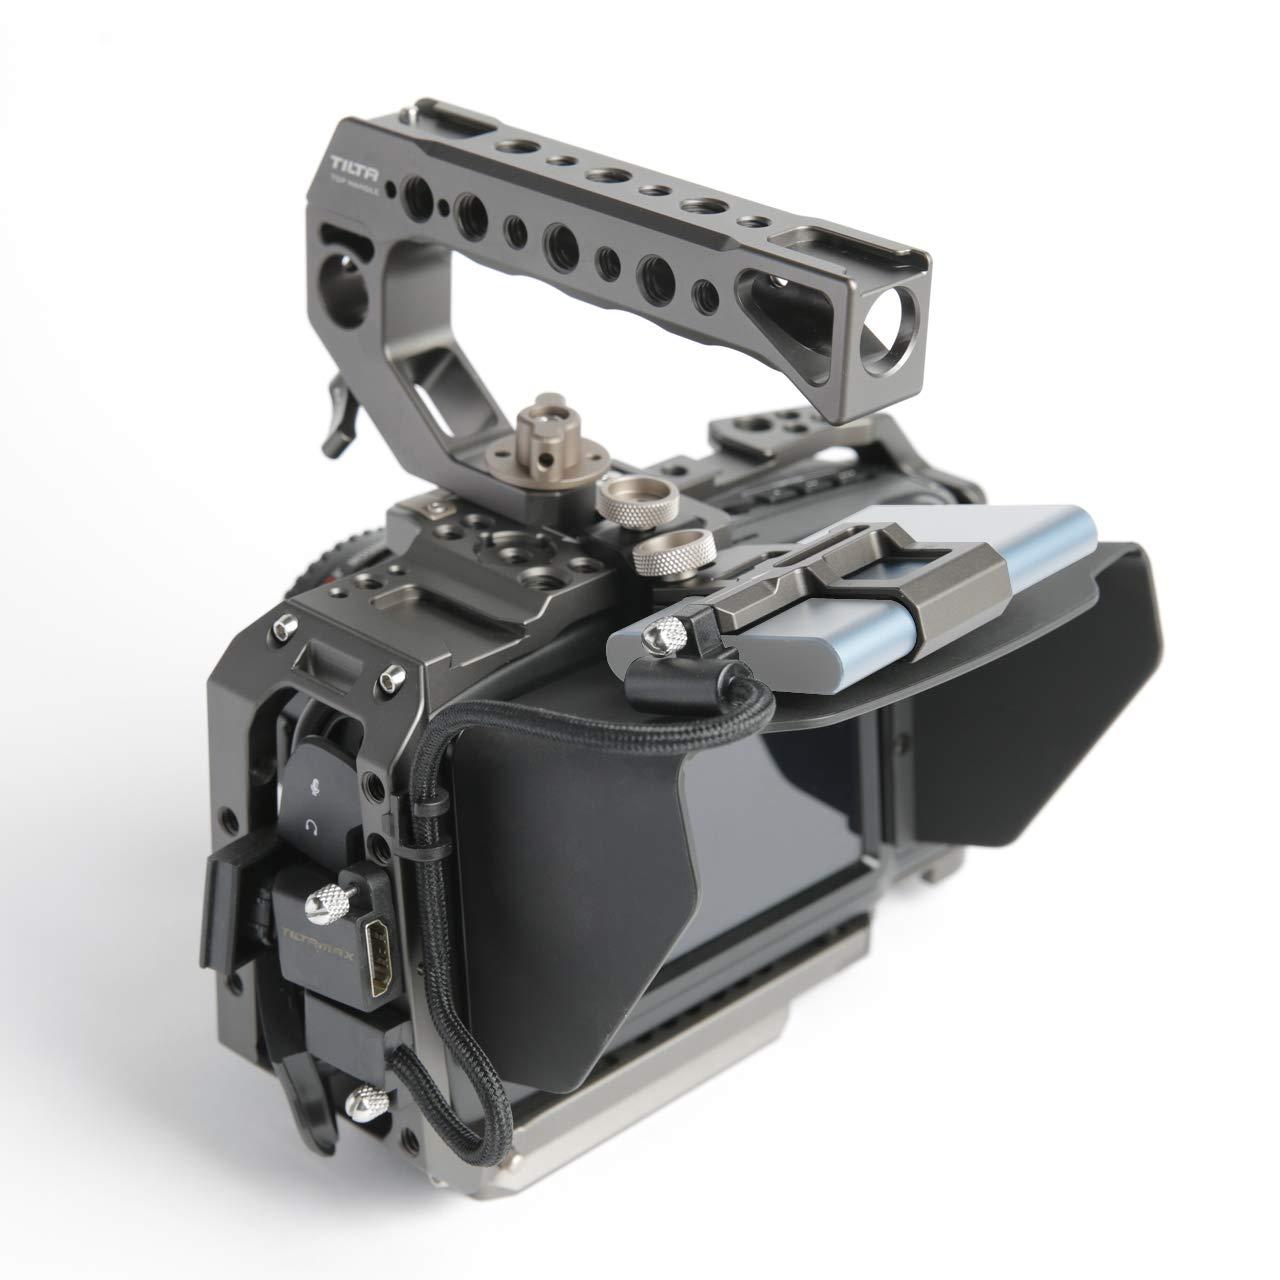 (Tilta Gray) TILTA TA-T01-B-G-2 BMPCC 4K / BMPCC 6K Cage Blackmagic Pocket Cinema Camera 4K / 6K Cage Rig + Half Sunhood ( Basic 2 Kit )